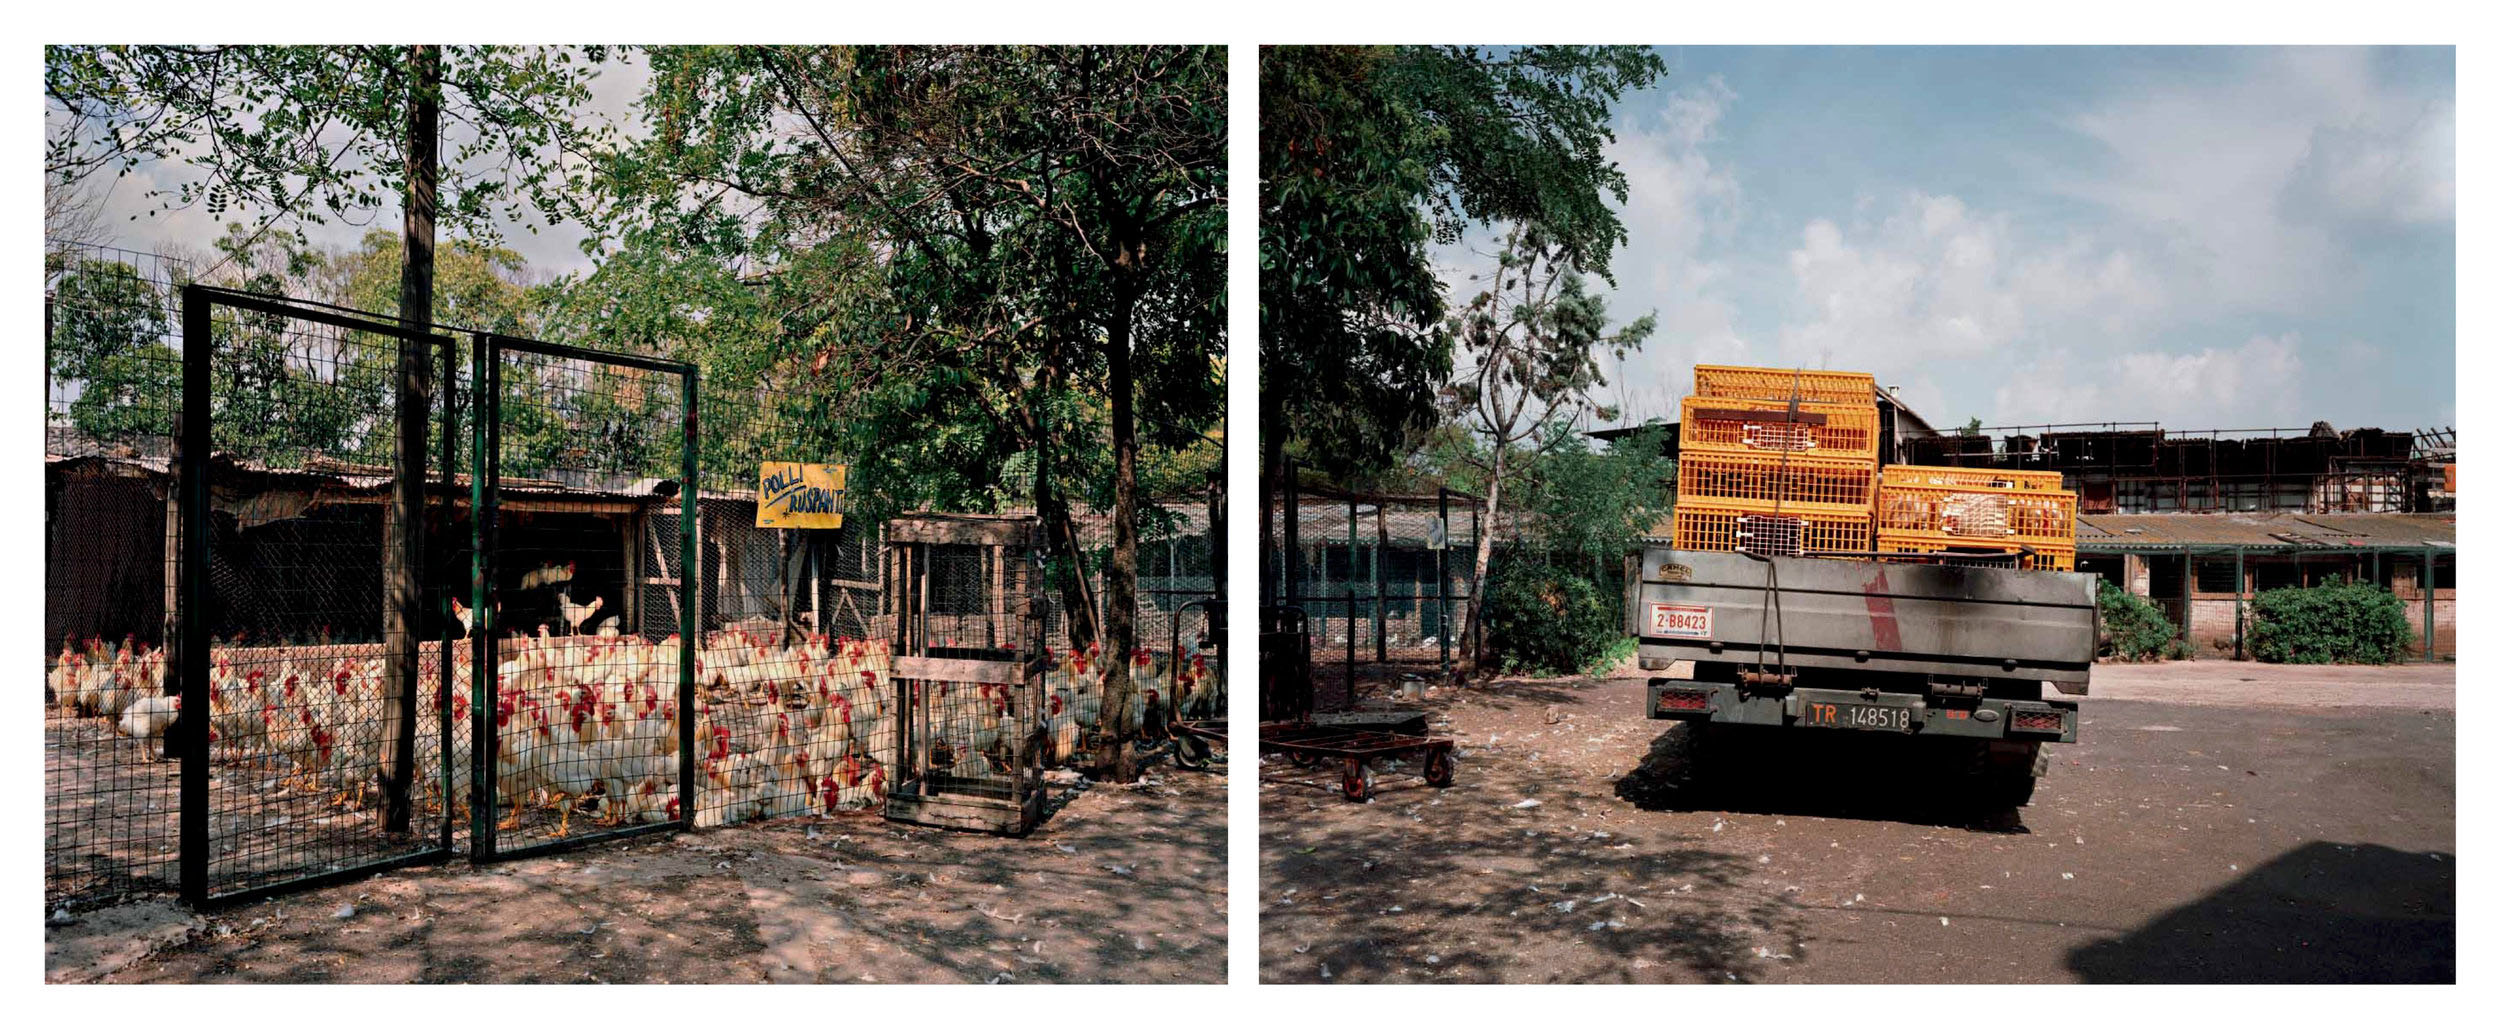 Free-range chickens, Cinecitta, Rome, July 1990